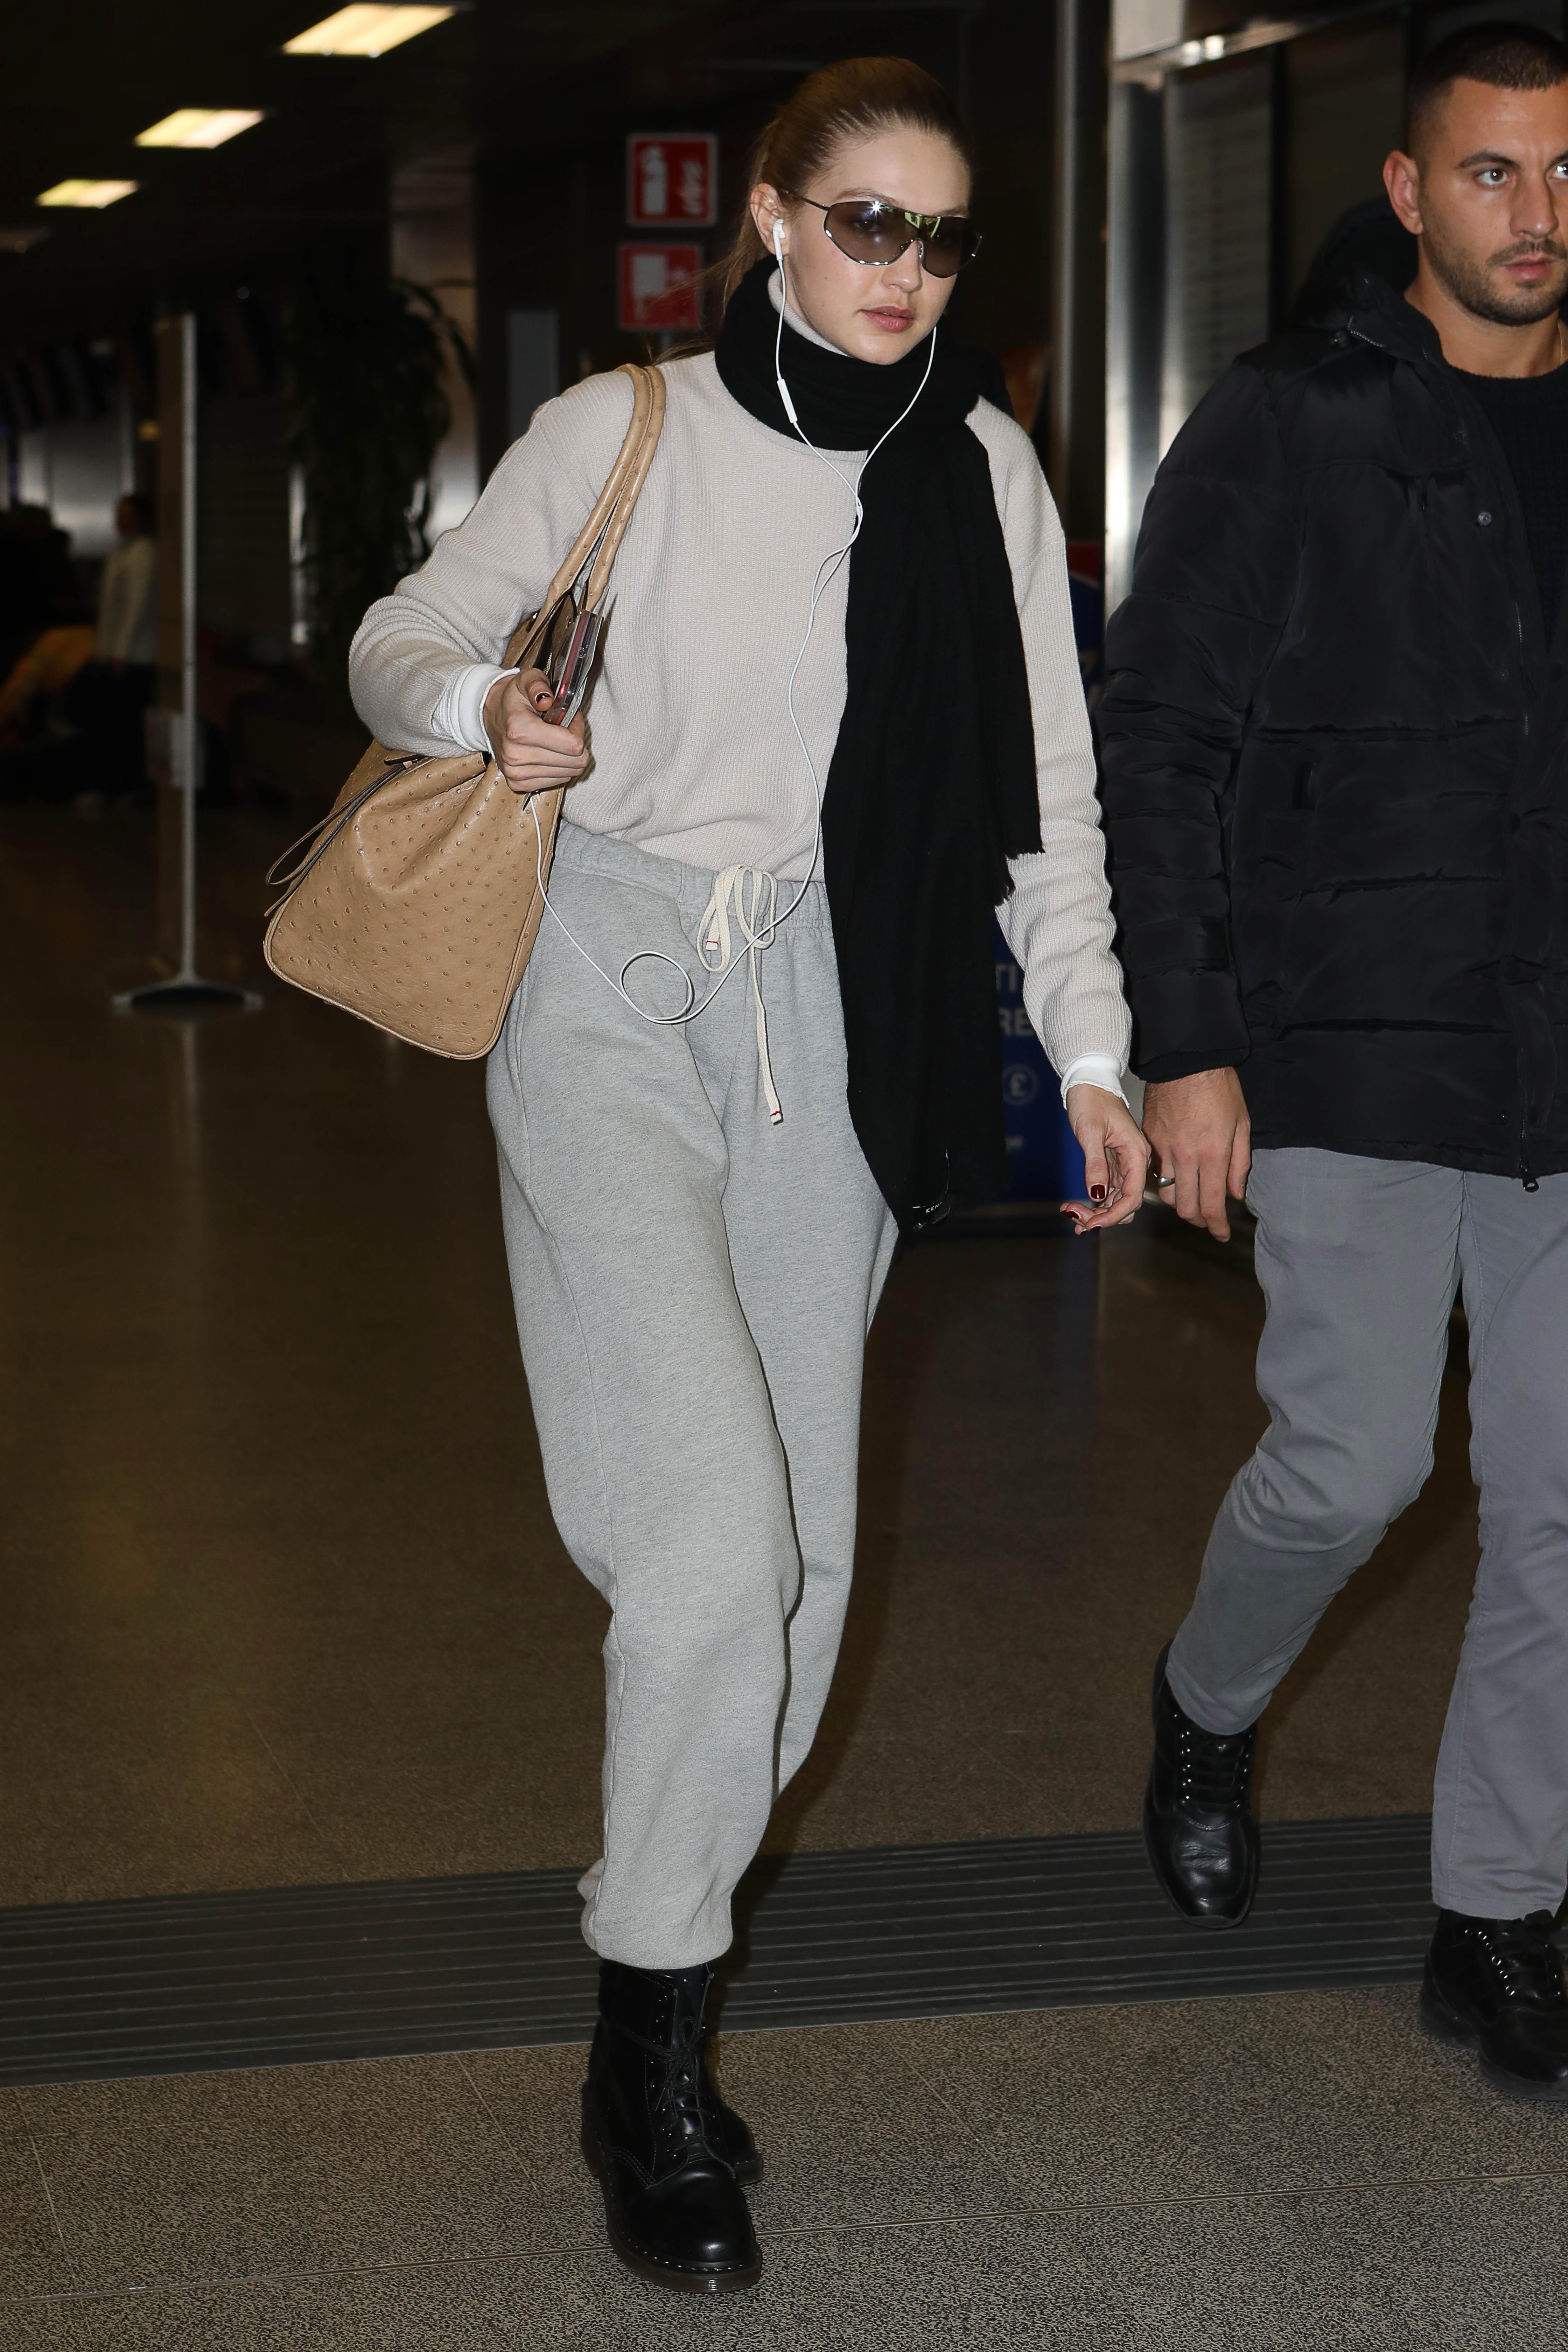 Gigi Hadid Milan Fashion Week Getty Images 1